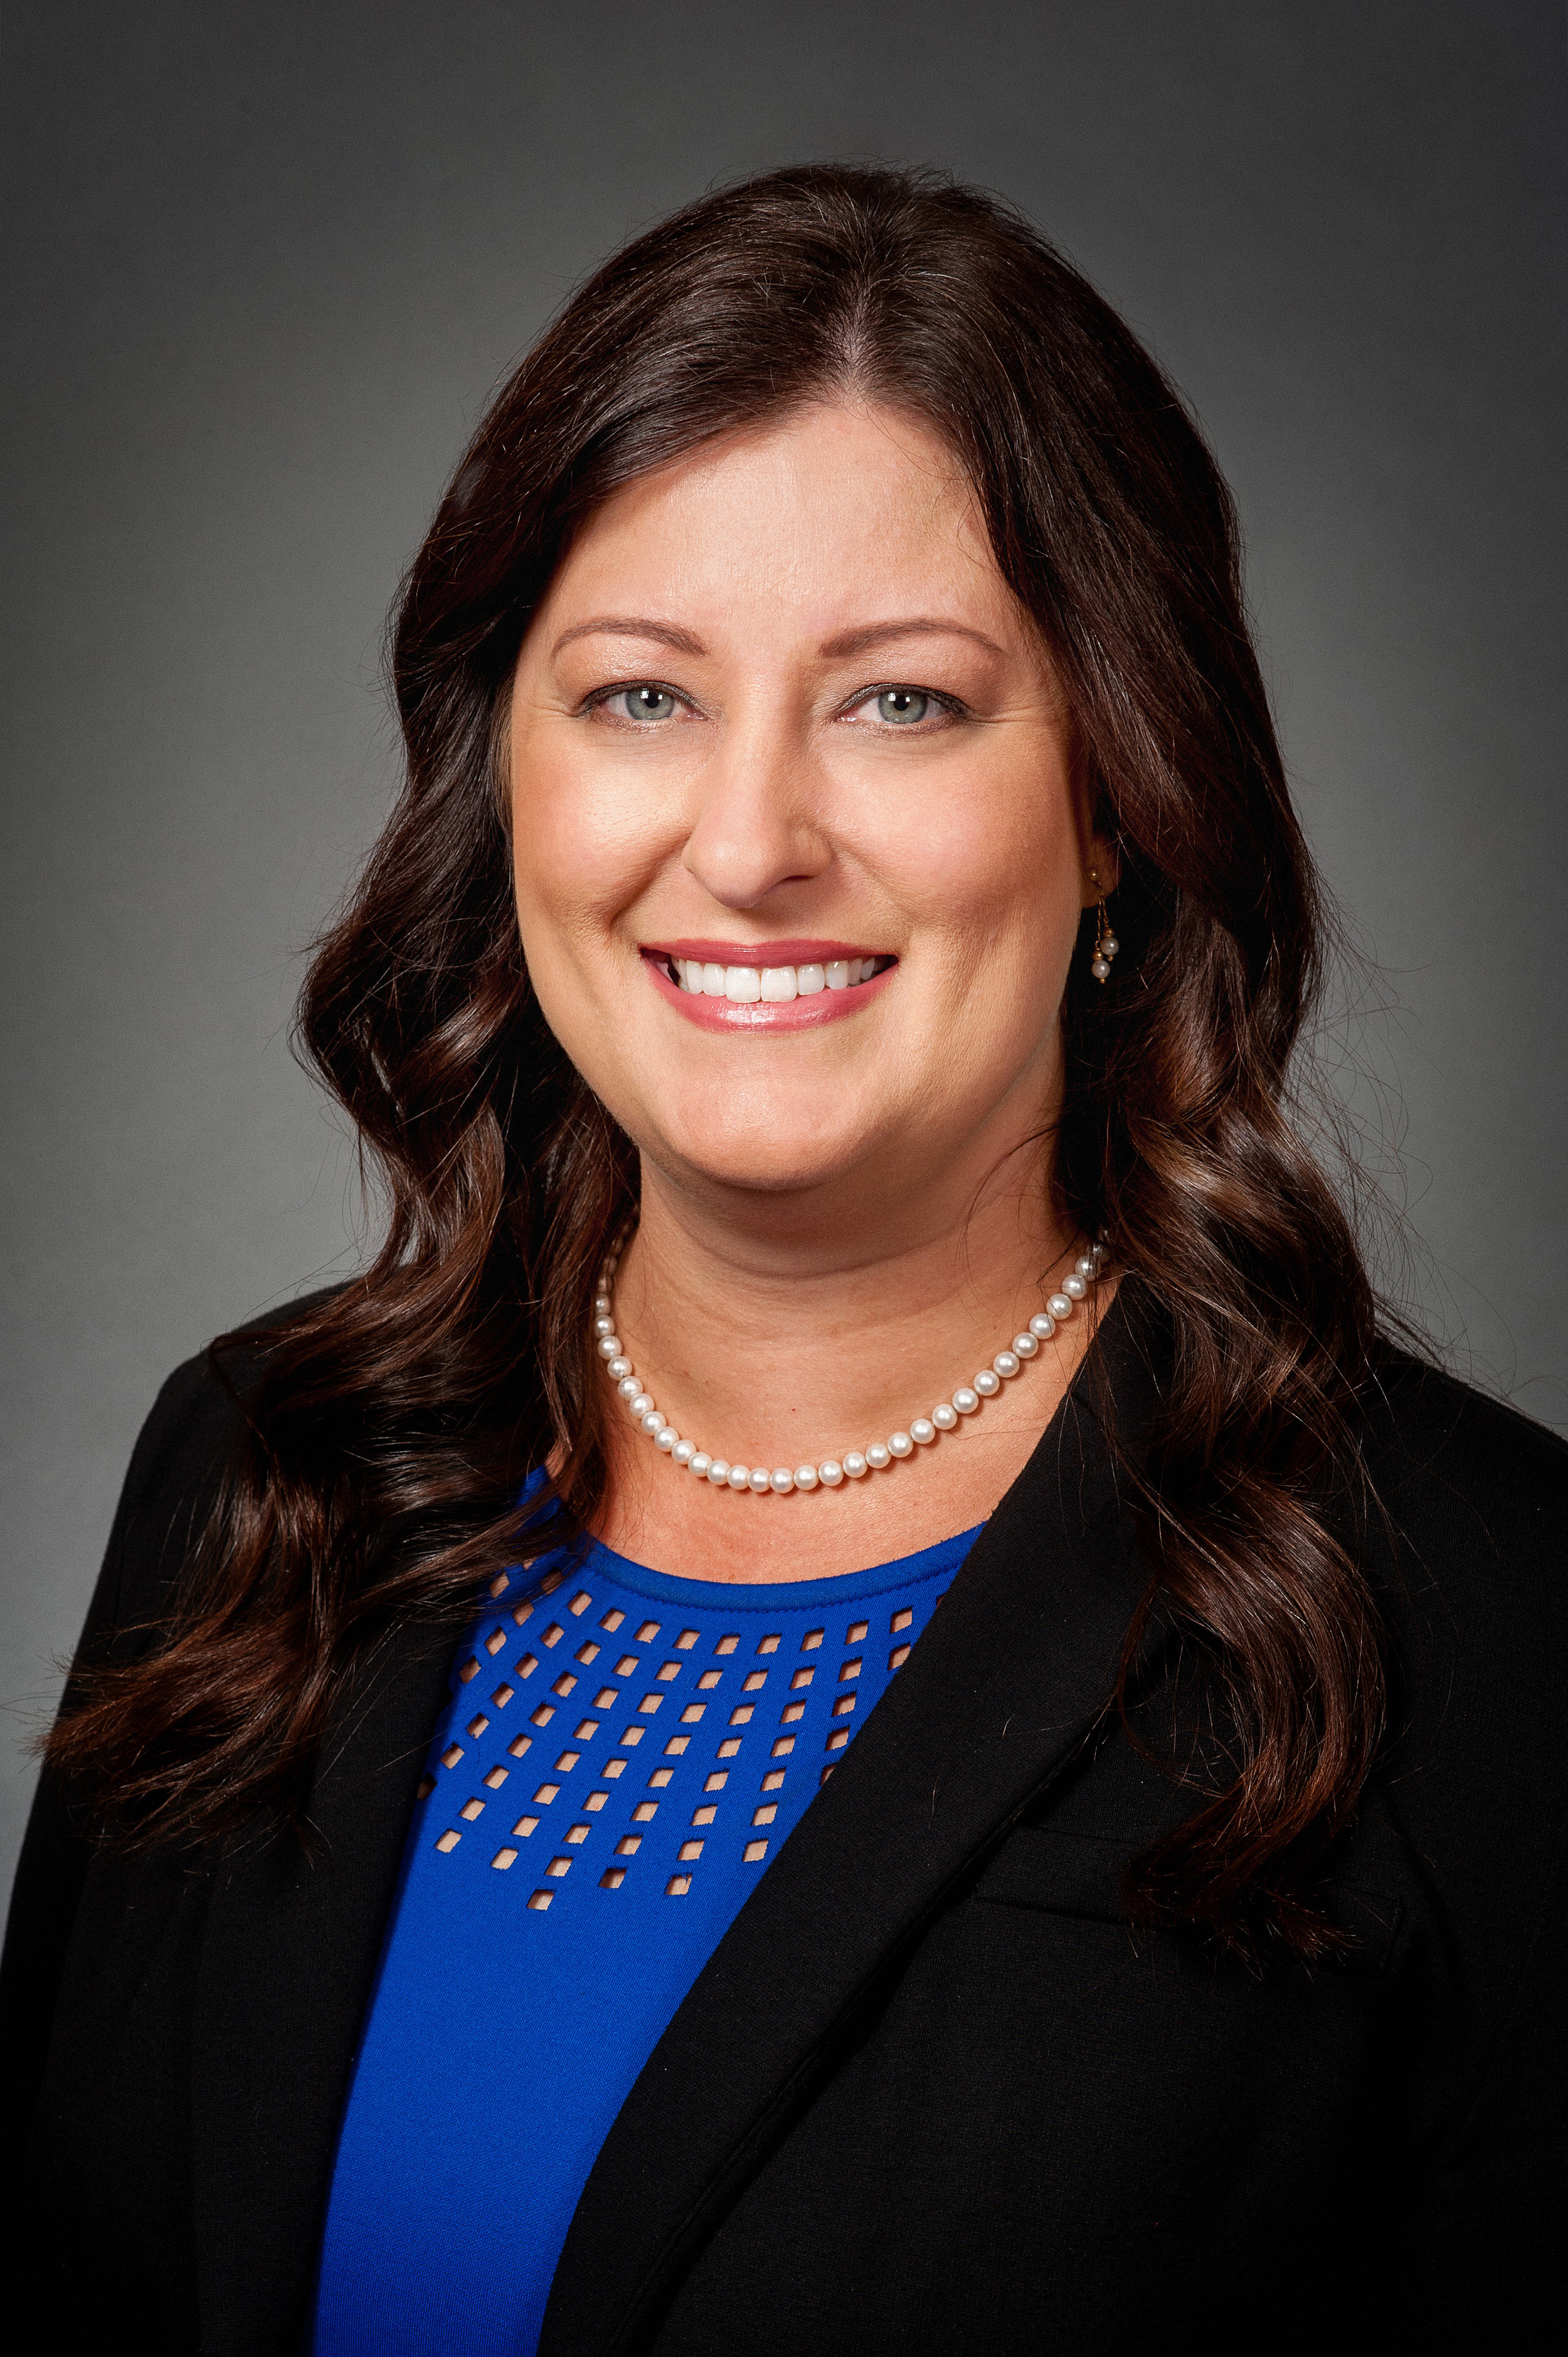 Laura Anne Pray, CPA - Audit Partner